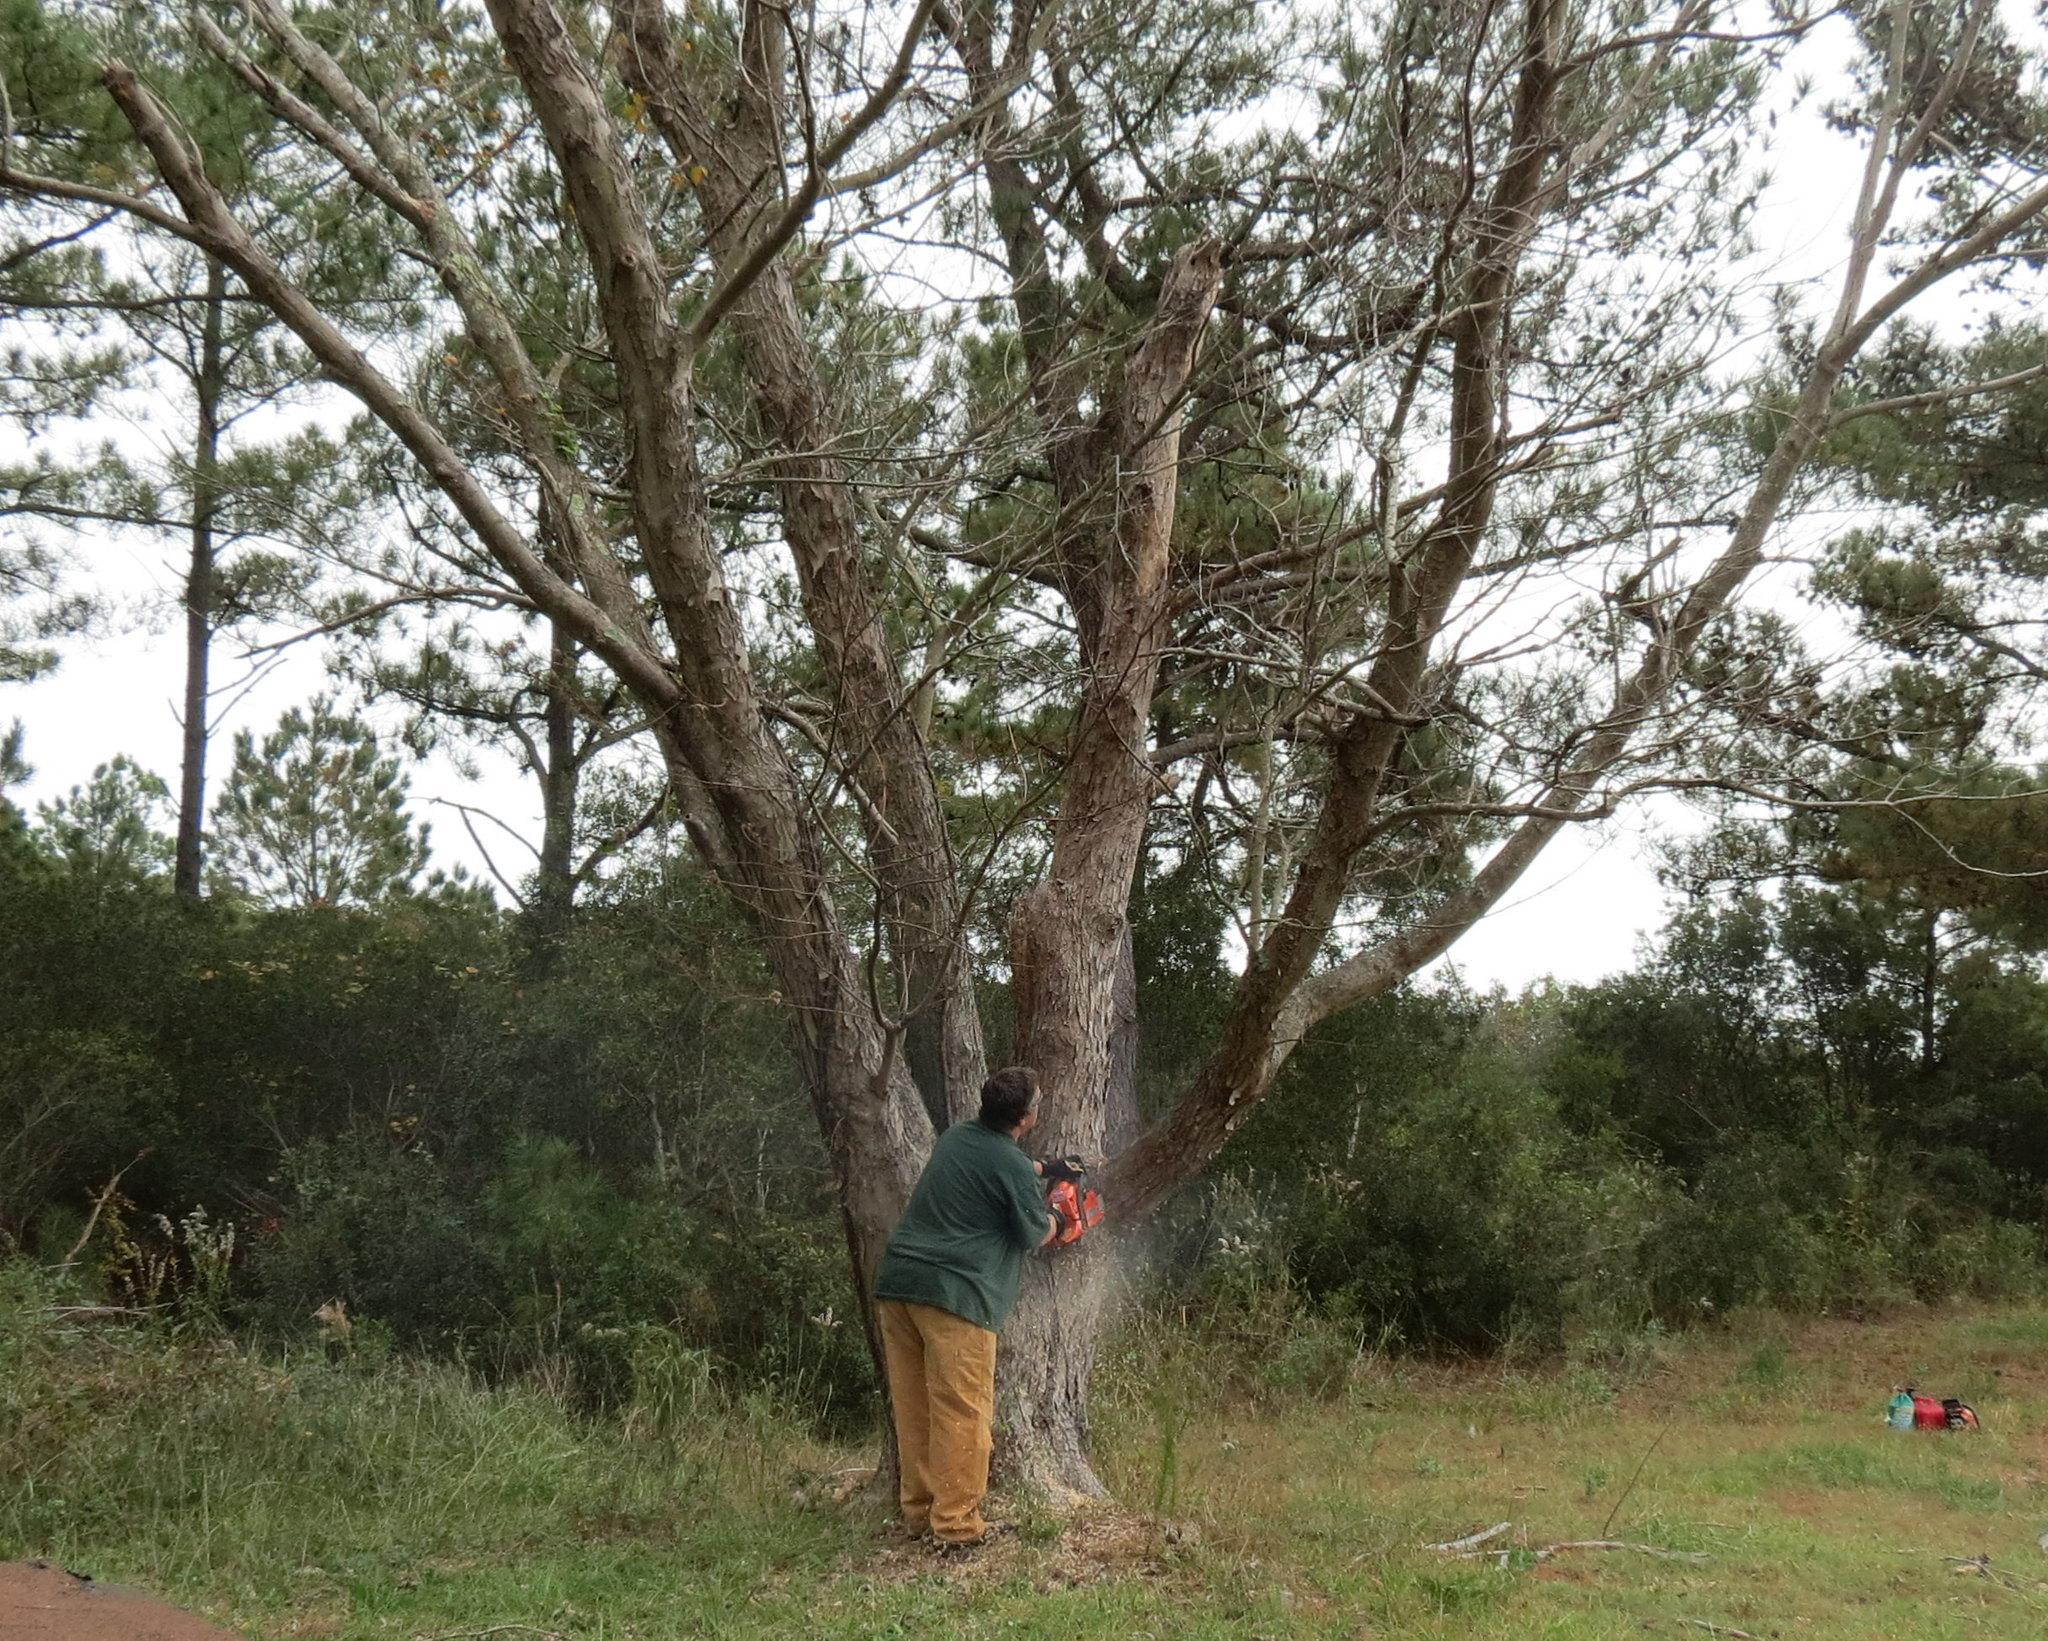 badoaktree